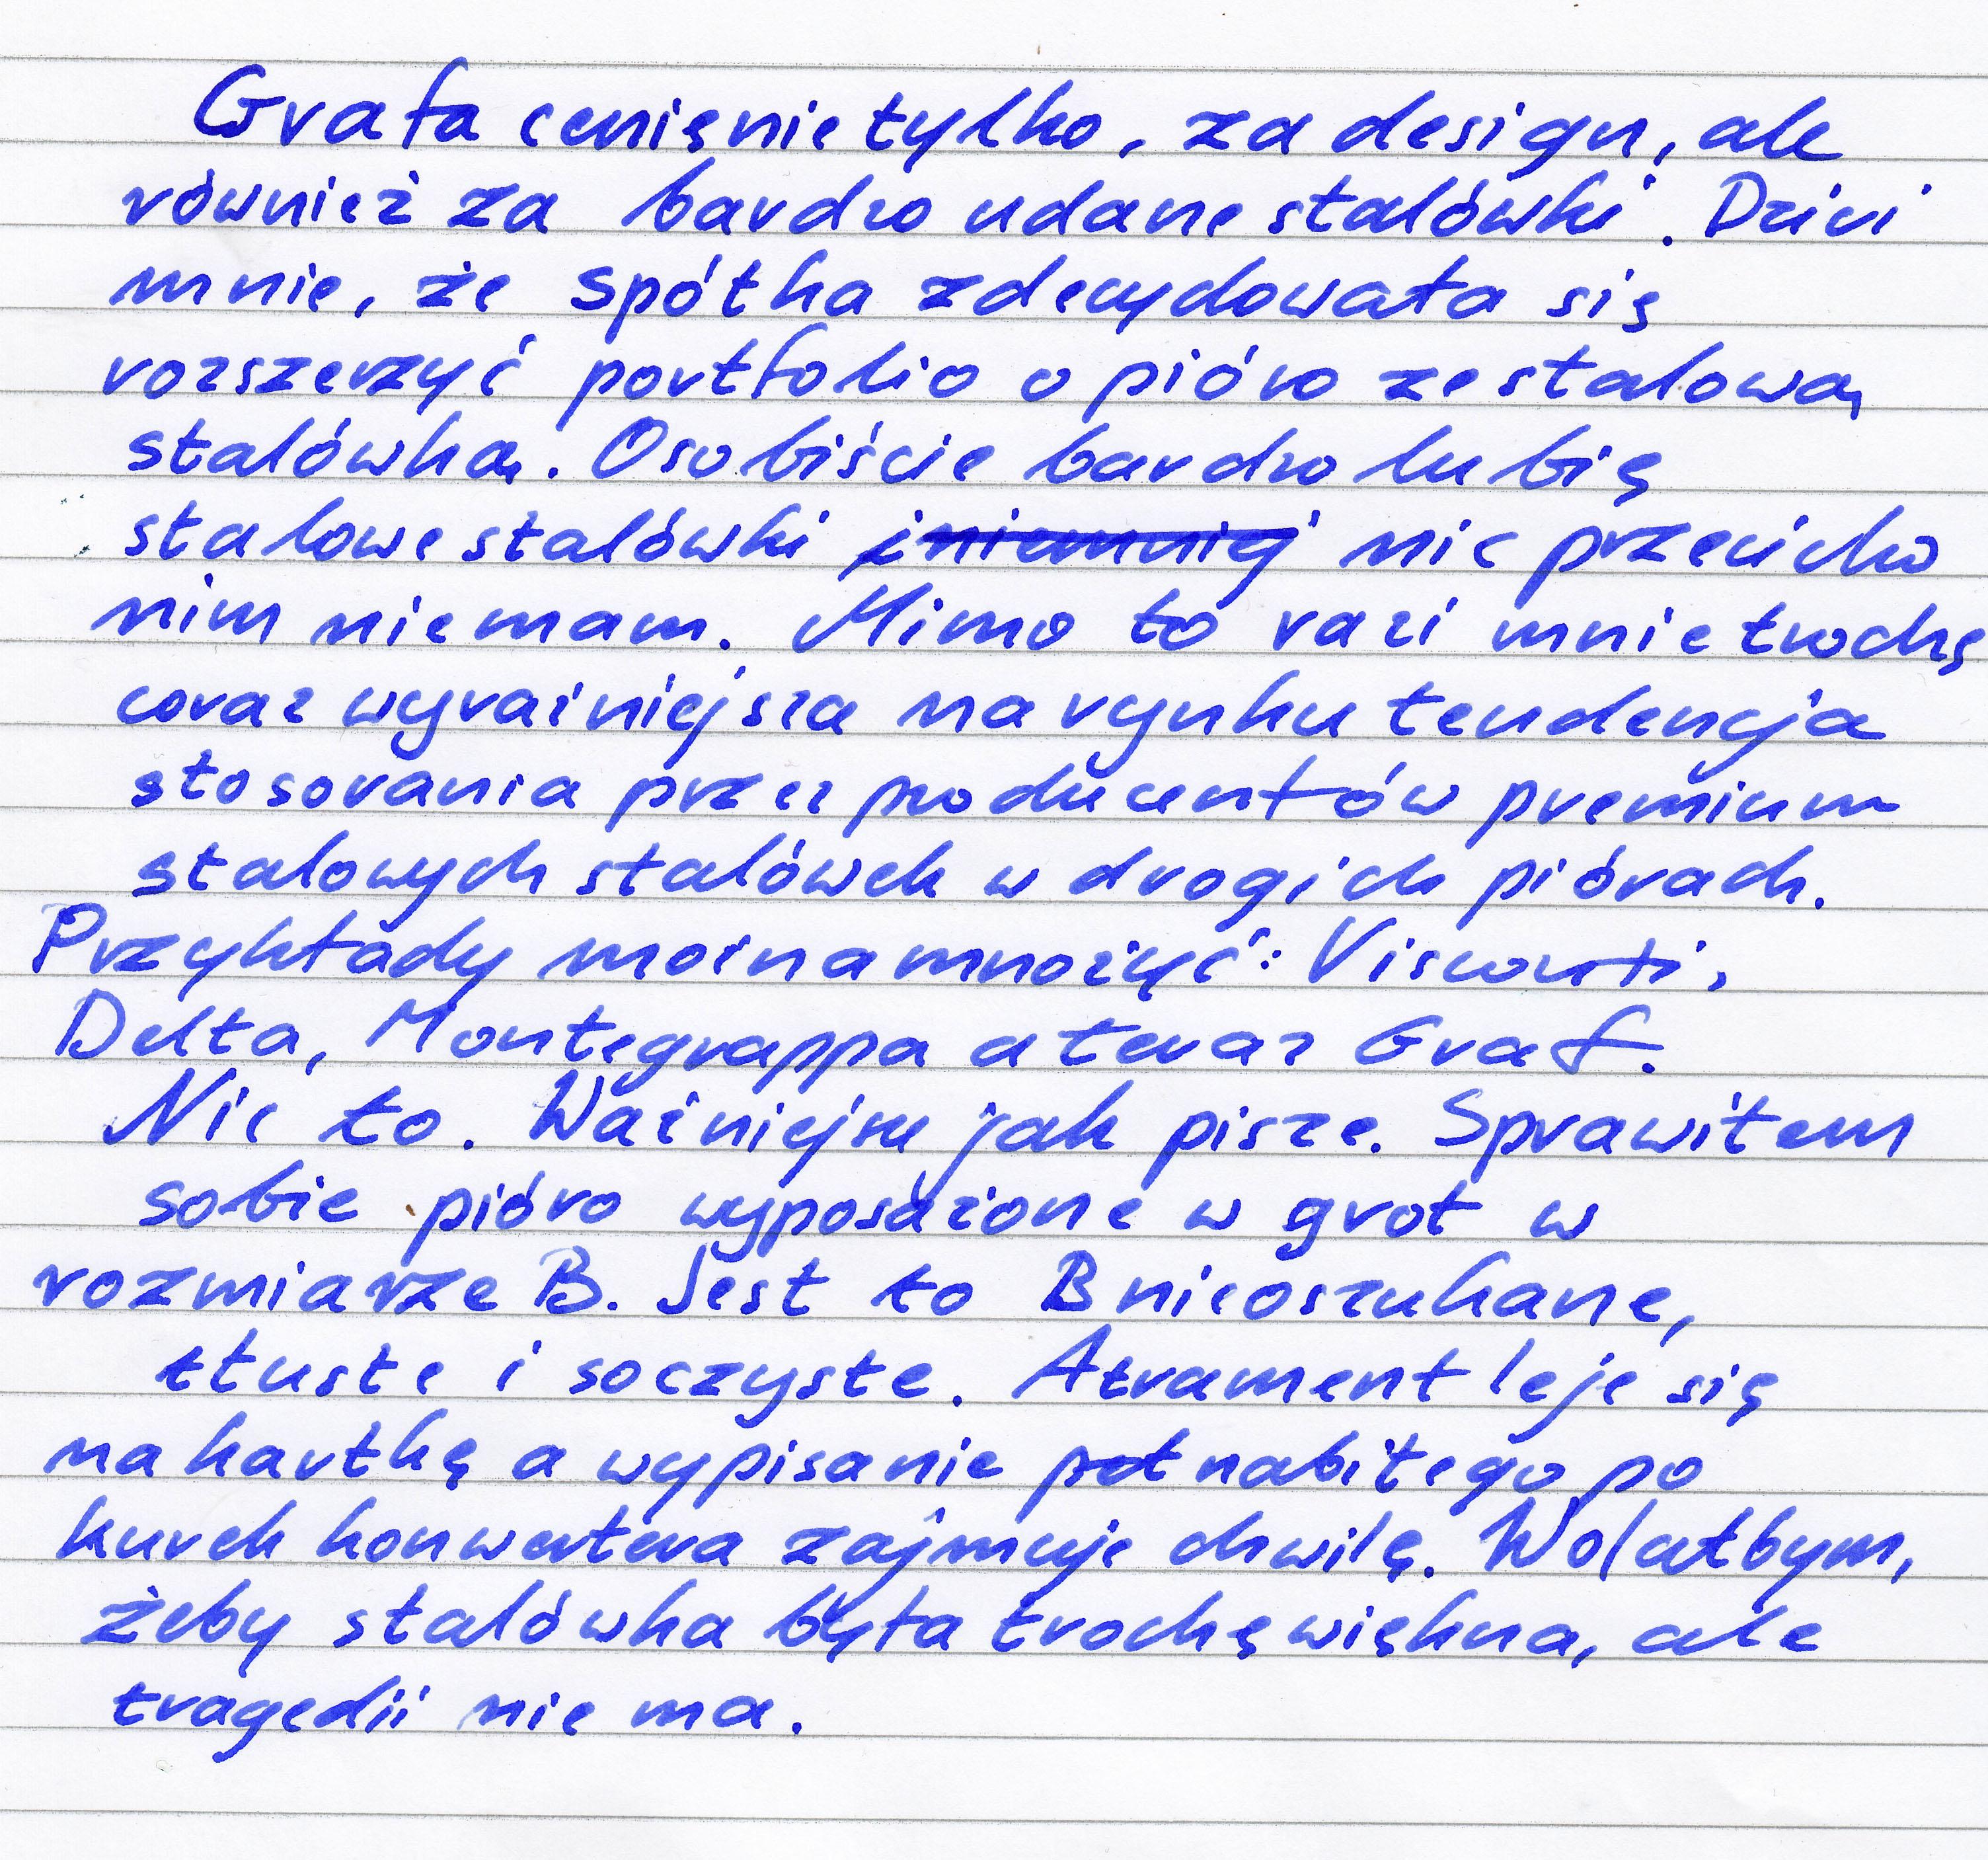 fpn_1457270701__tamitio_pismo.jpg